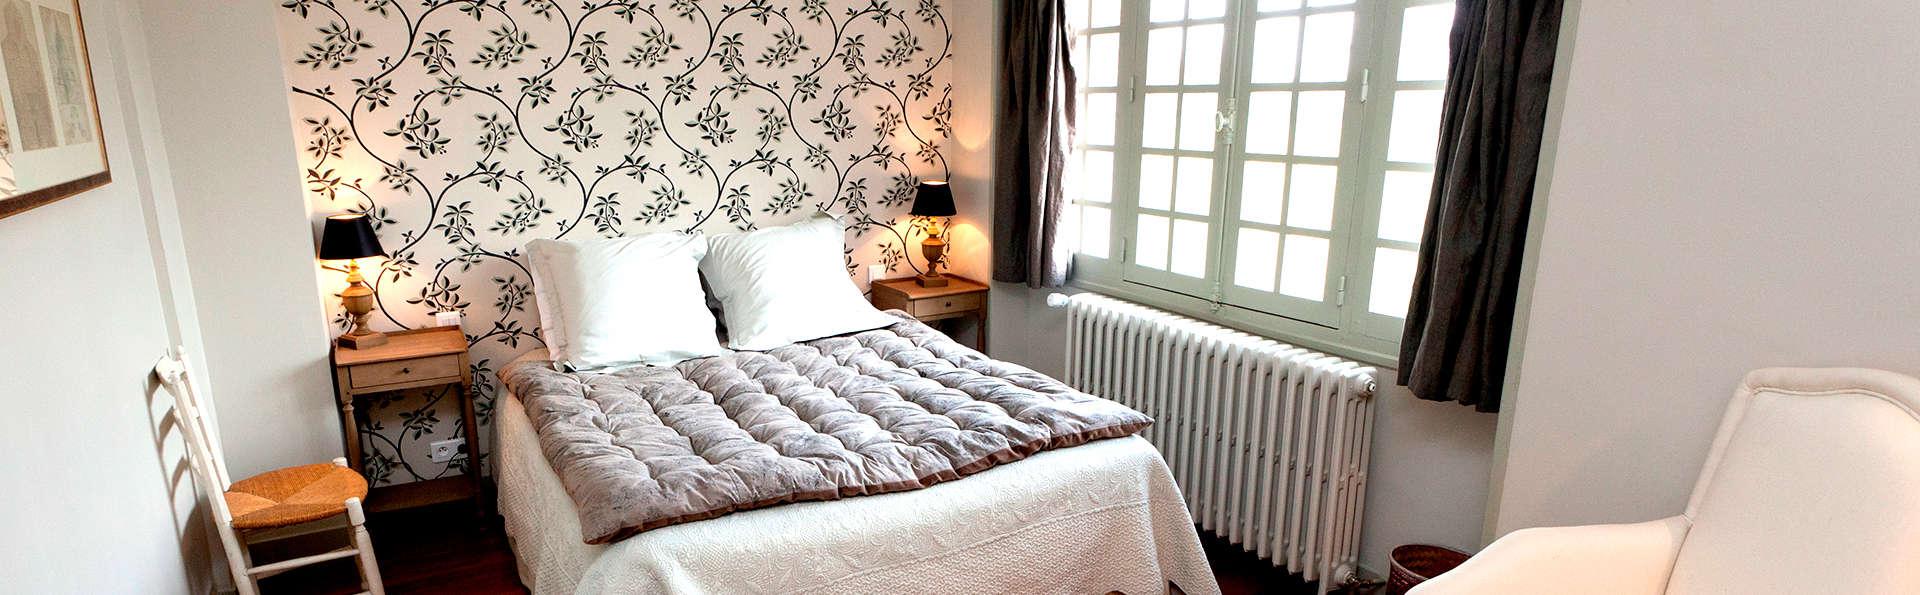 Manoir de Beaumarchais - Edit_Room5.jpg